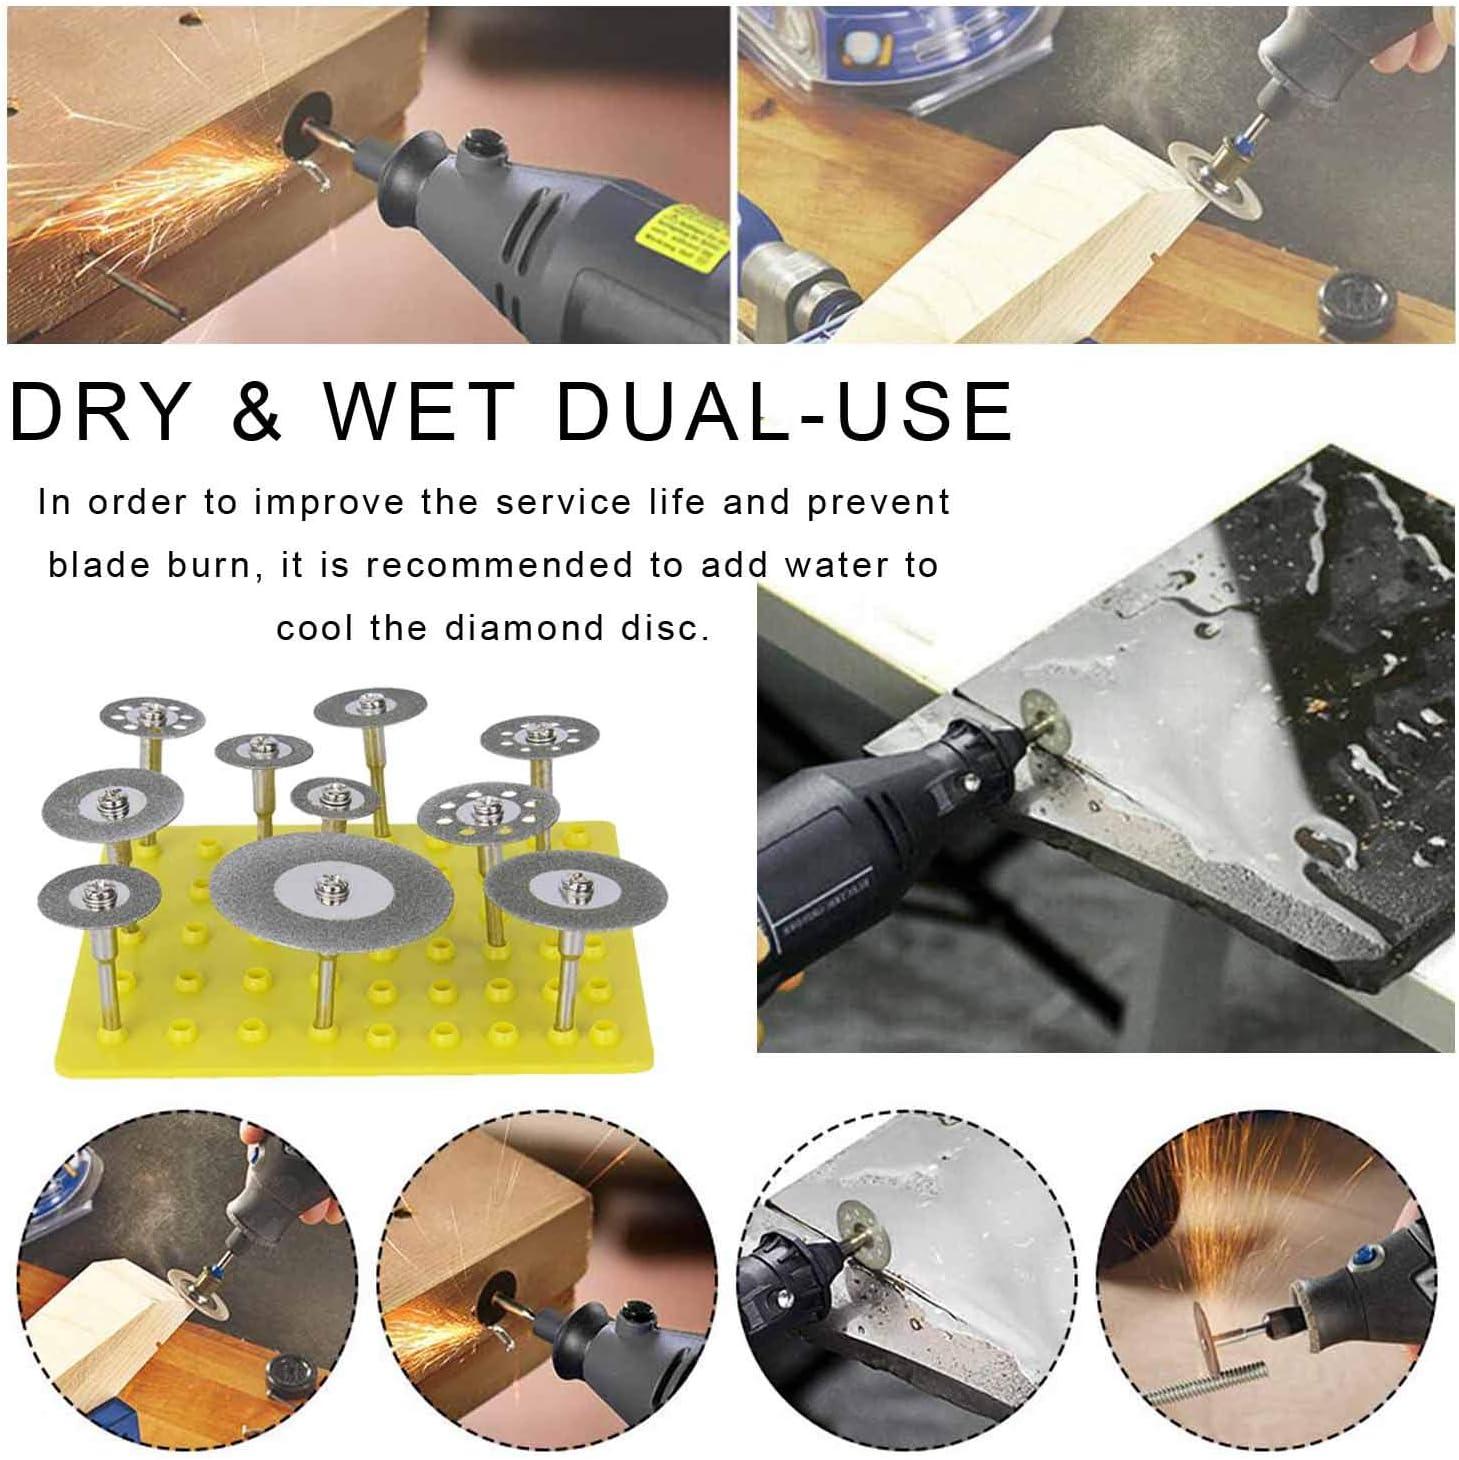 10 Pcs 1//8 Inch Circular Cutting Discs Cut-Off Wheel Blades Set for Rotary Tool Diamond Cutting Wheel